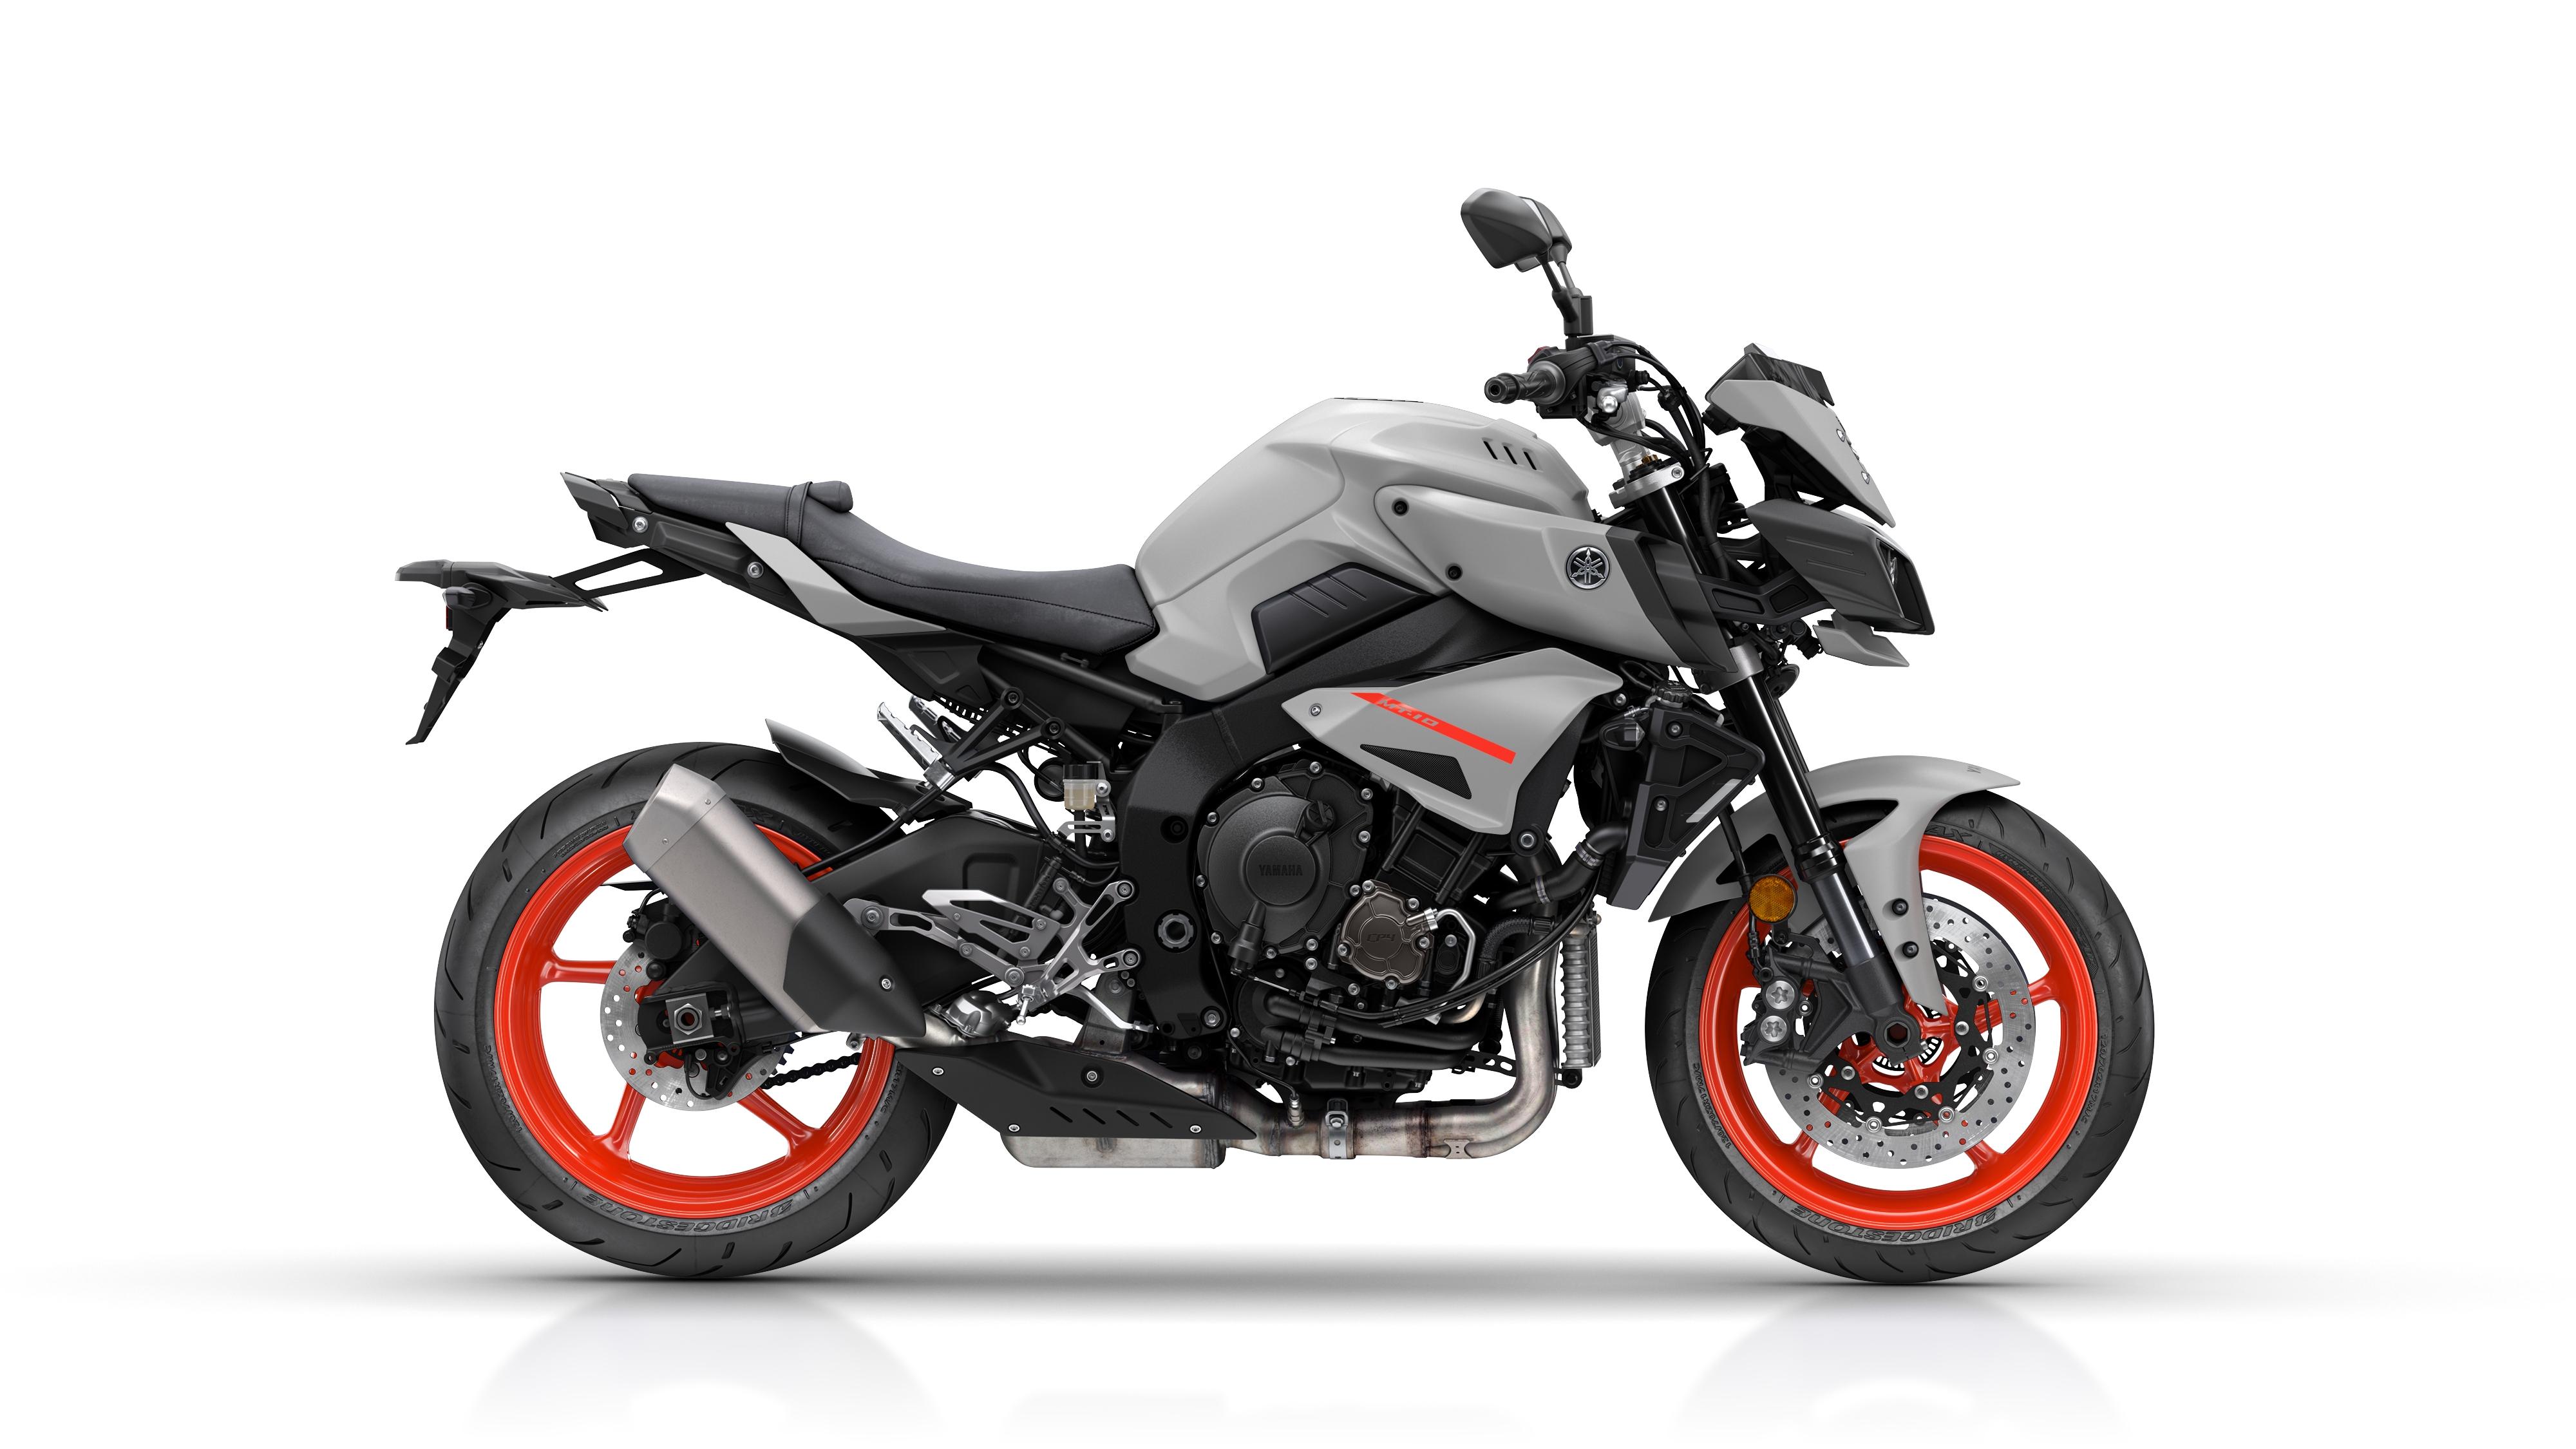 Yamaha MT-10 ABS - MotorCentrumWest